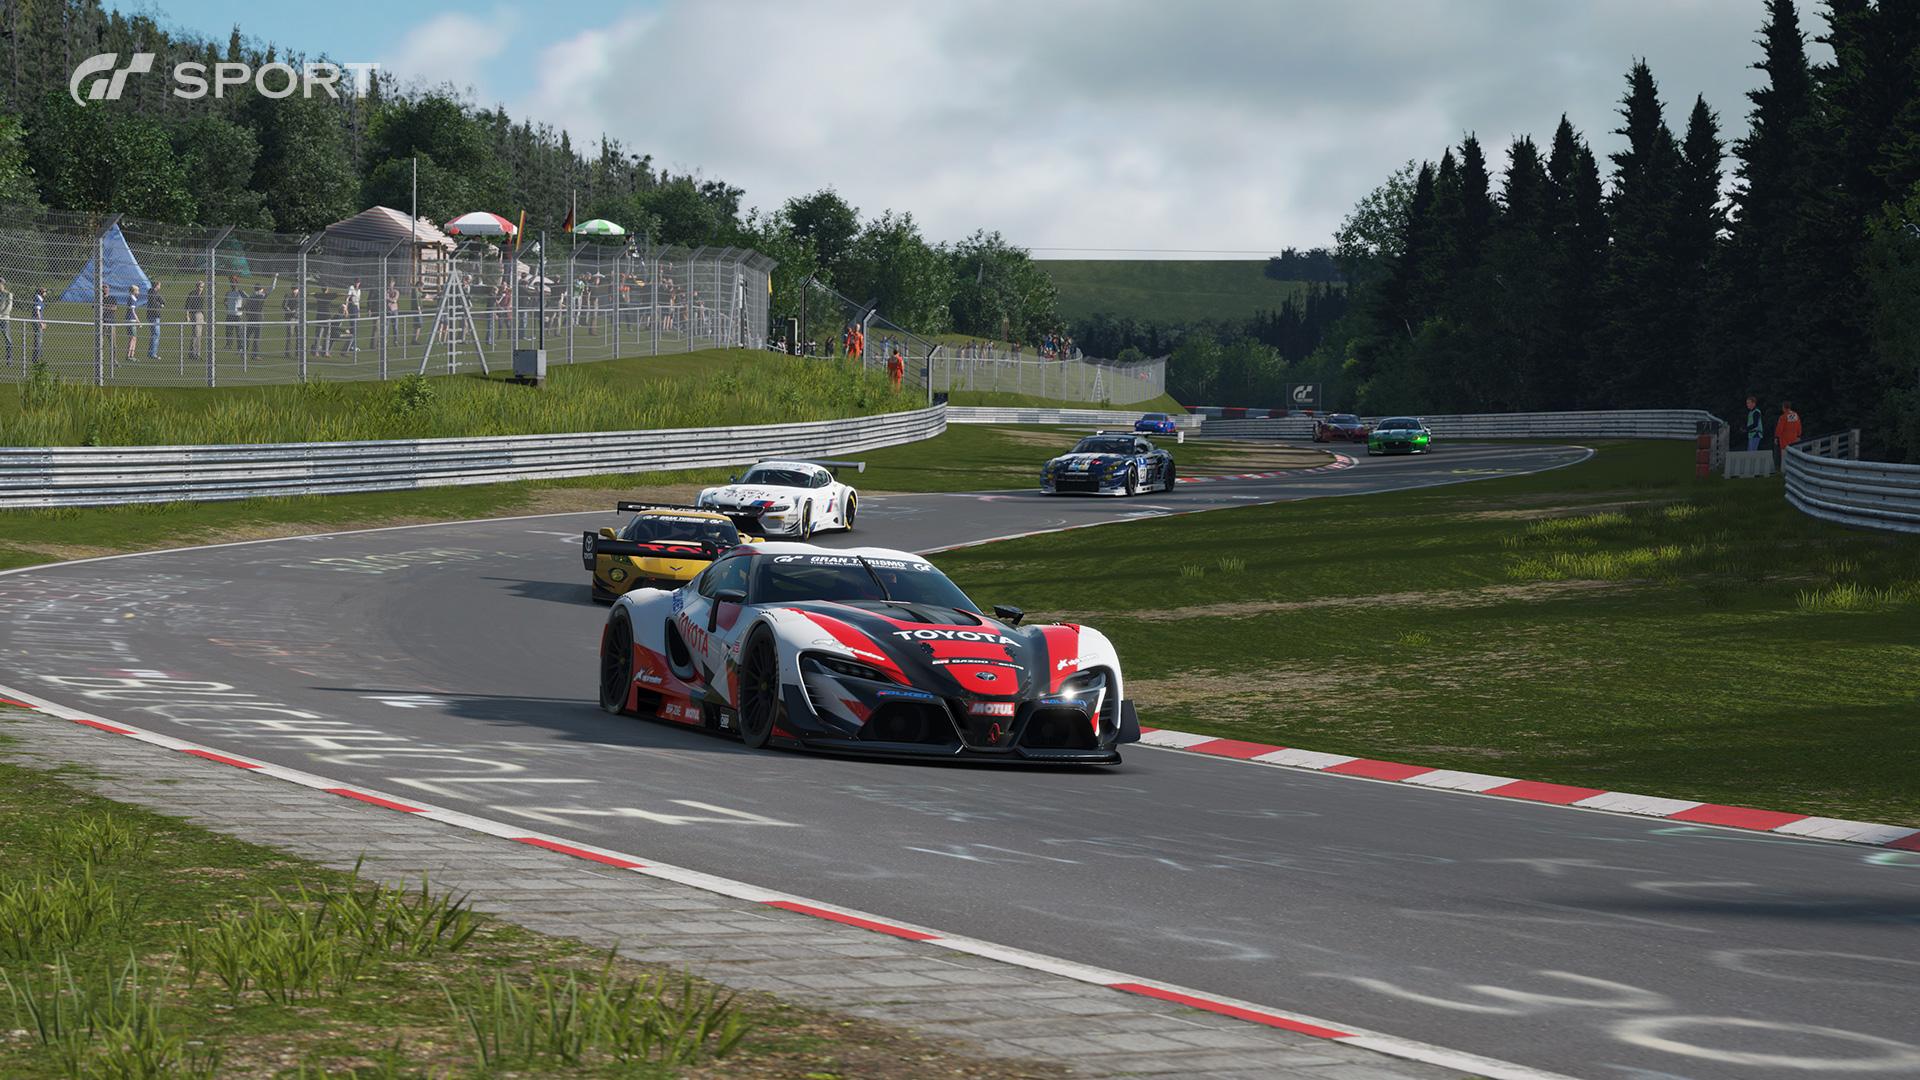 GTSport_Race_Nurburgring_Nordschleife_02_1463670248